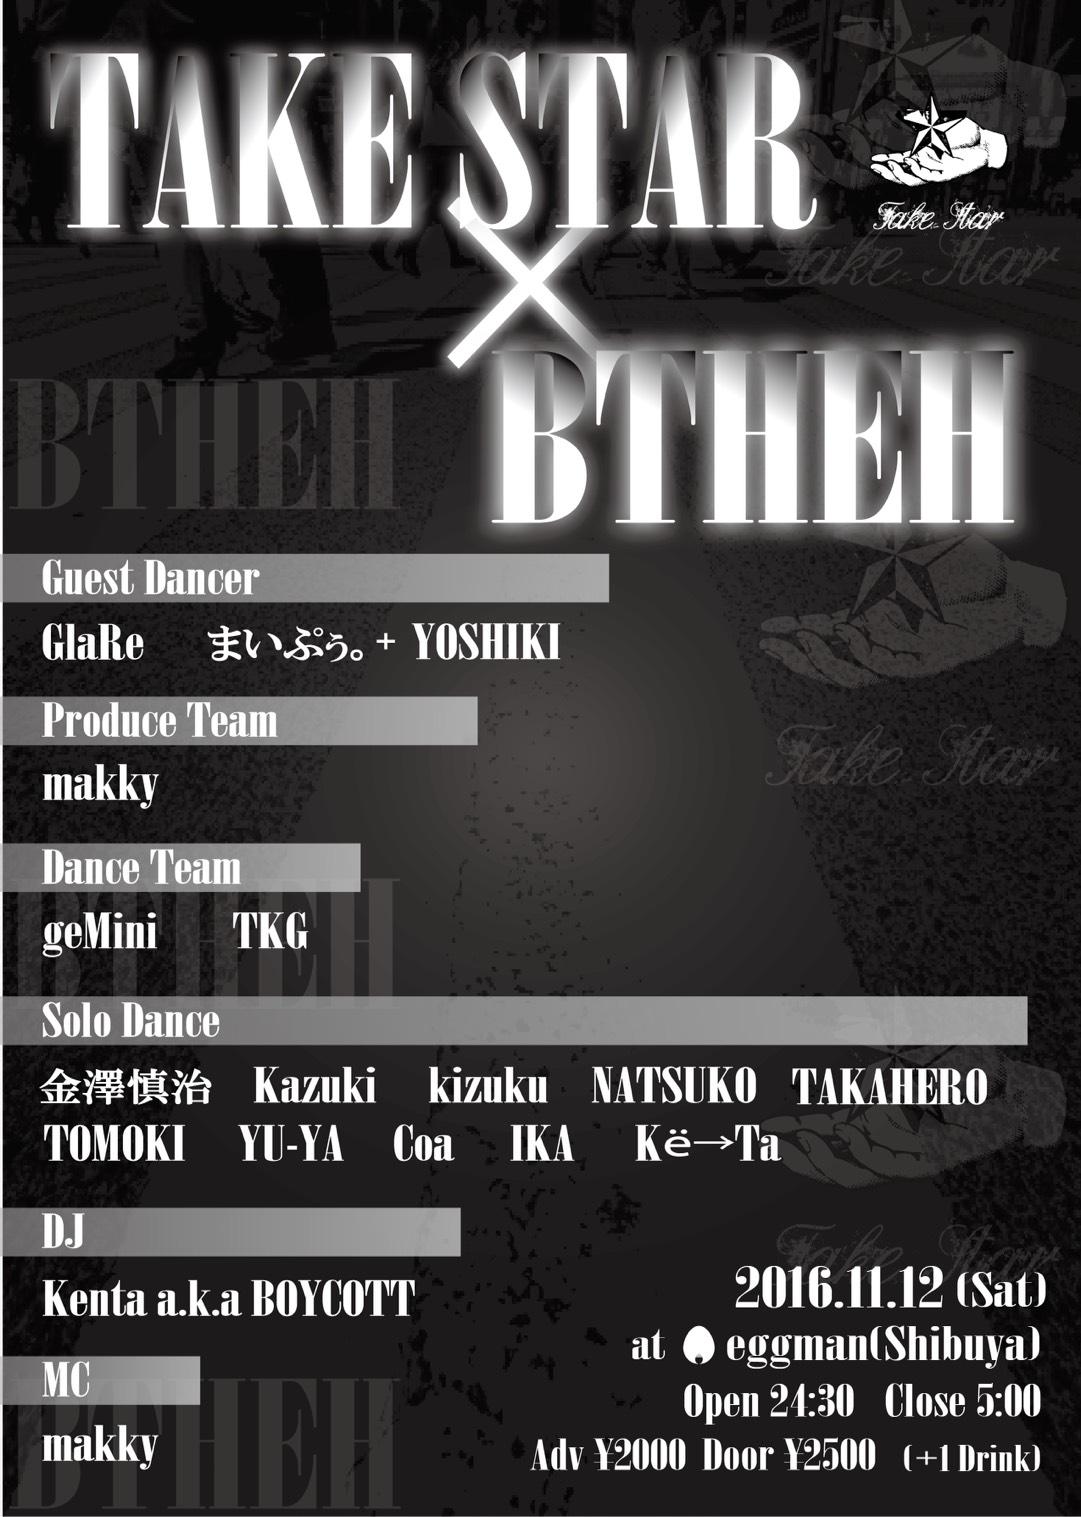 TAKESTAR × BTHEH